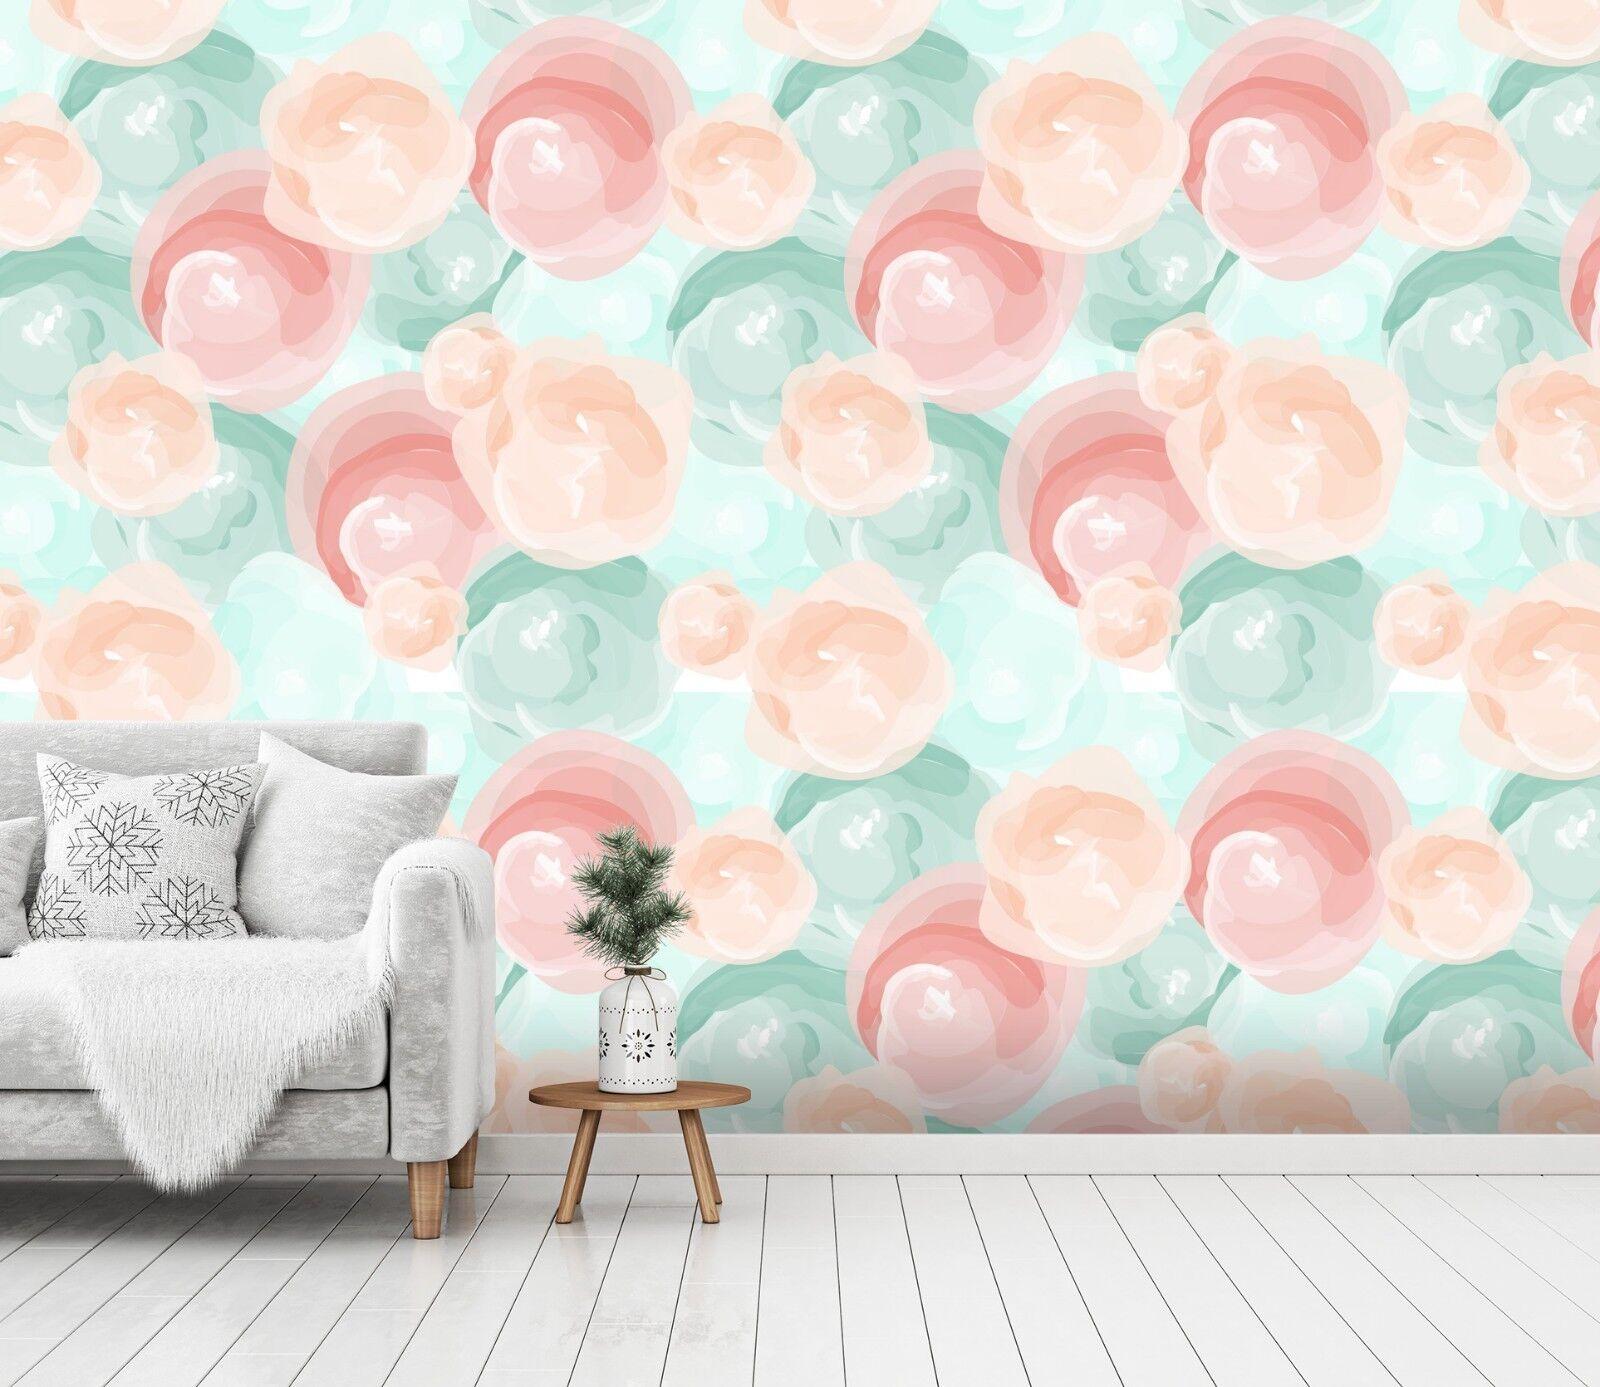 3D Mash Up Small Fresh 26 WallPaper Murals Wall Decal WallPaper AU Carly